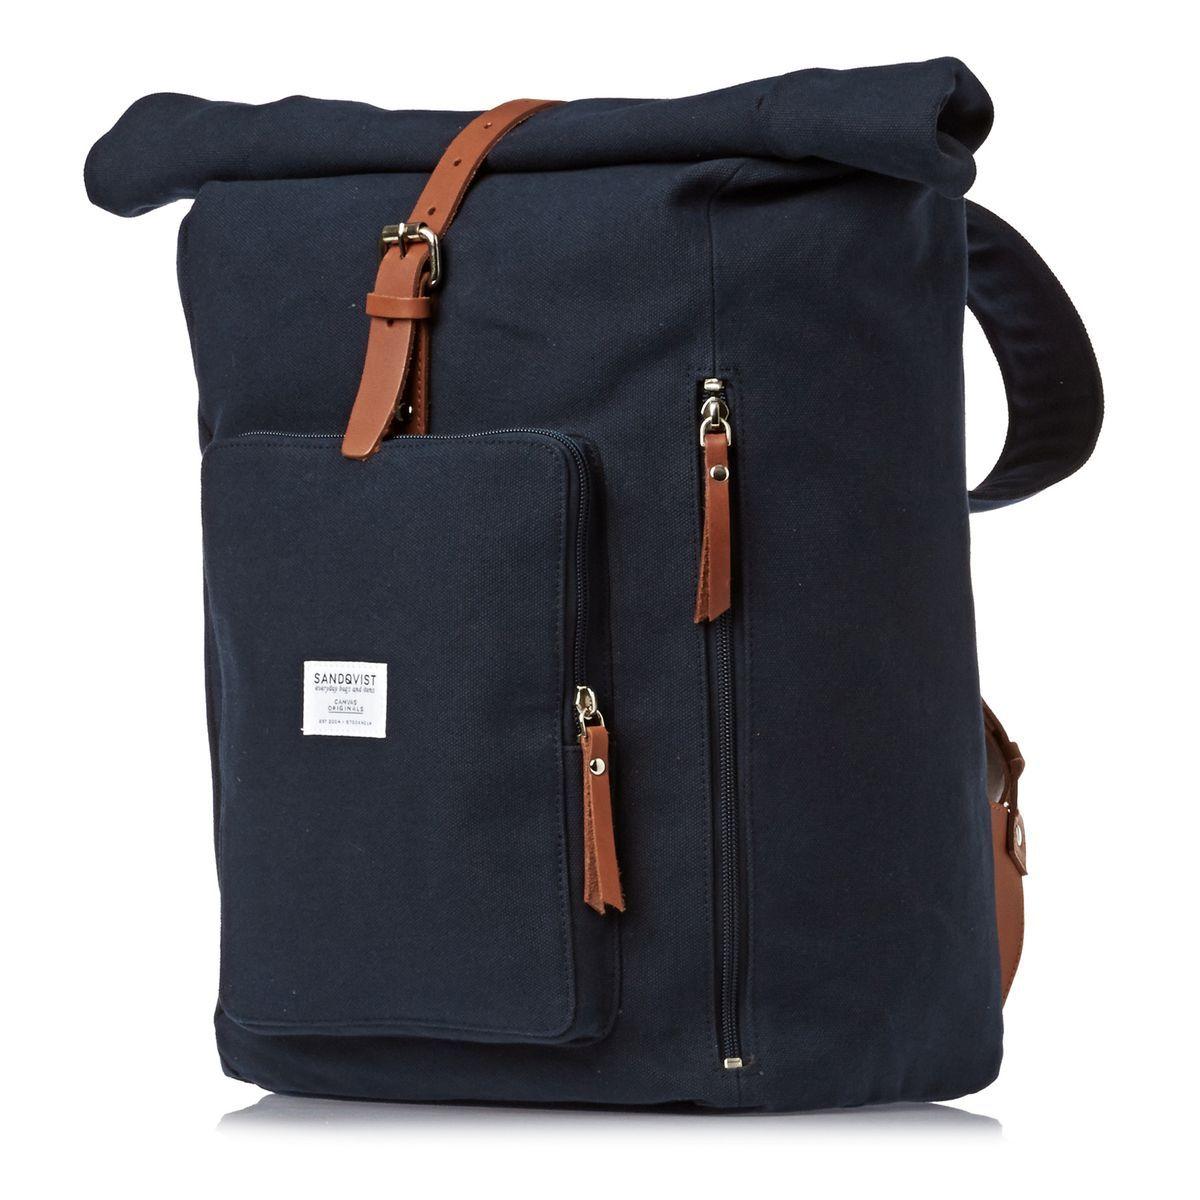 b5d17d446 Sandqvist Backpacks - Sandqvist Jerry Backpack - Blue   ACCESORIES ...